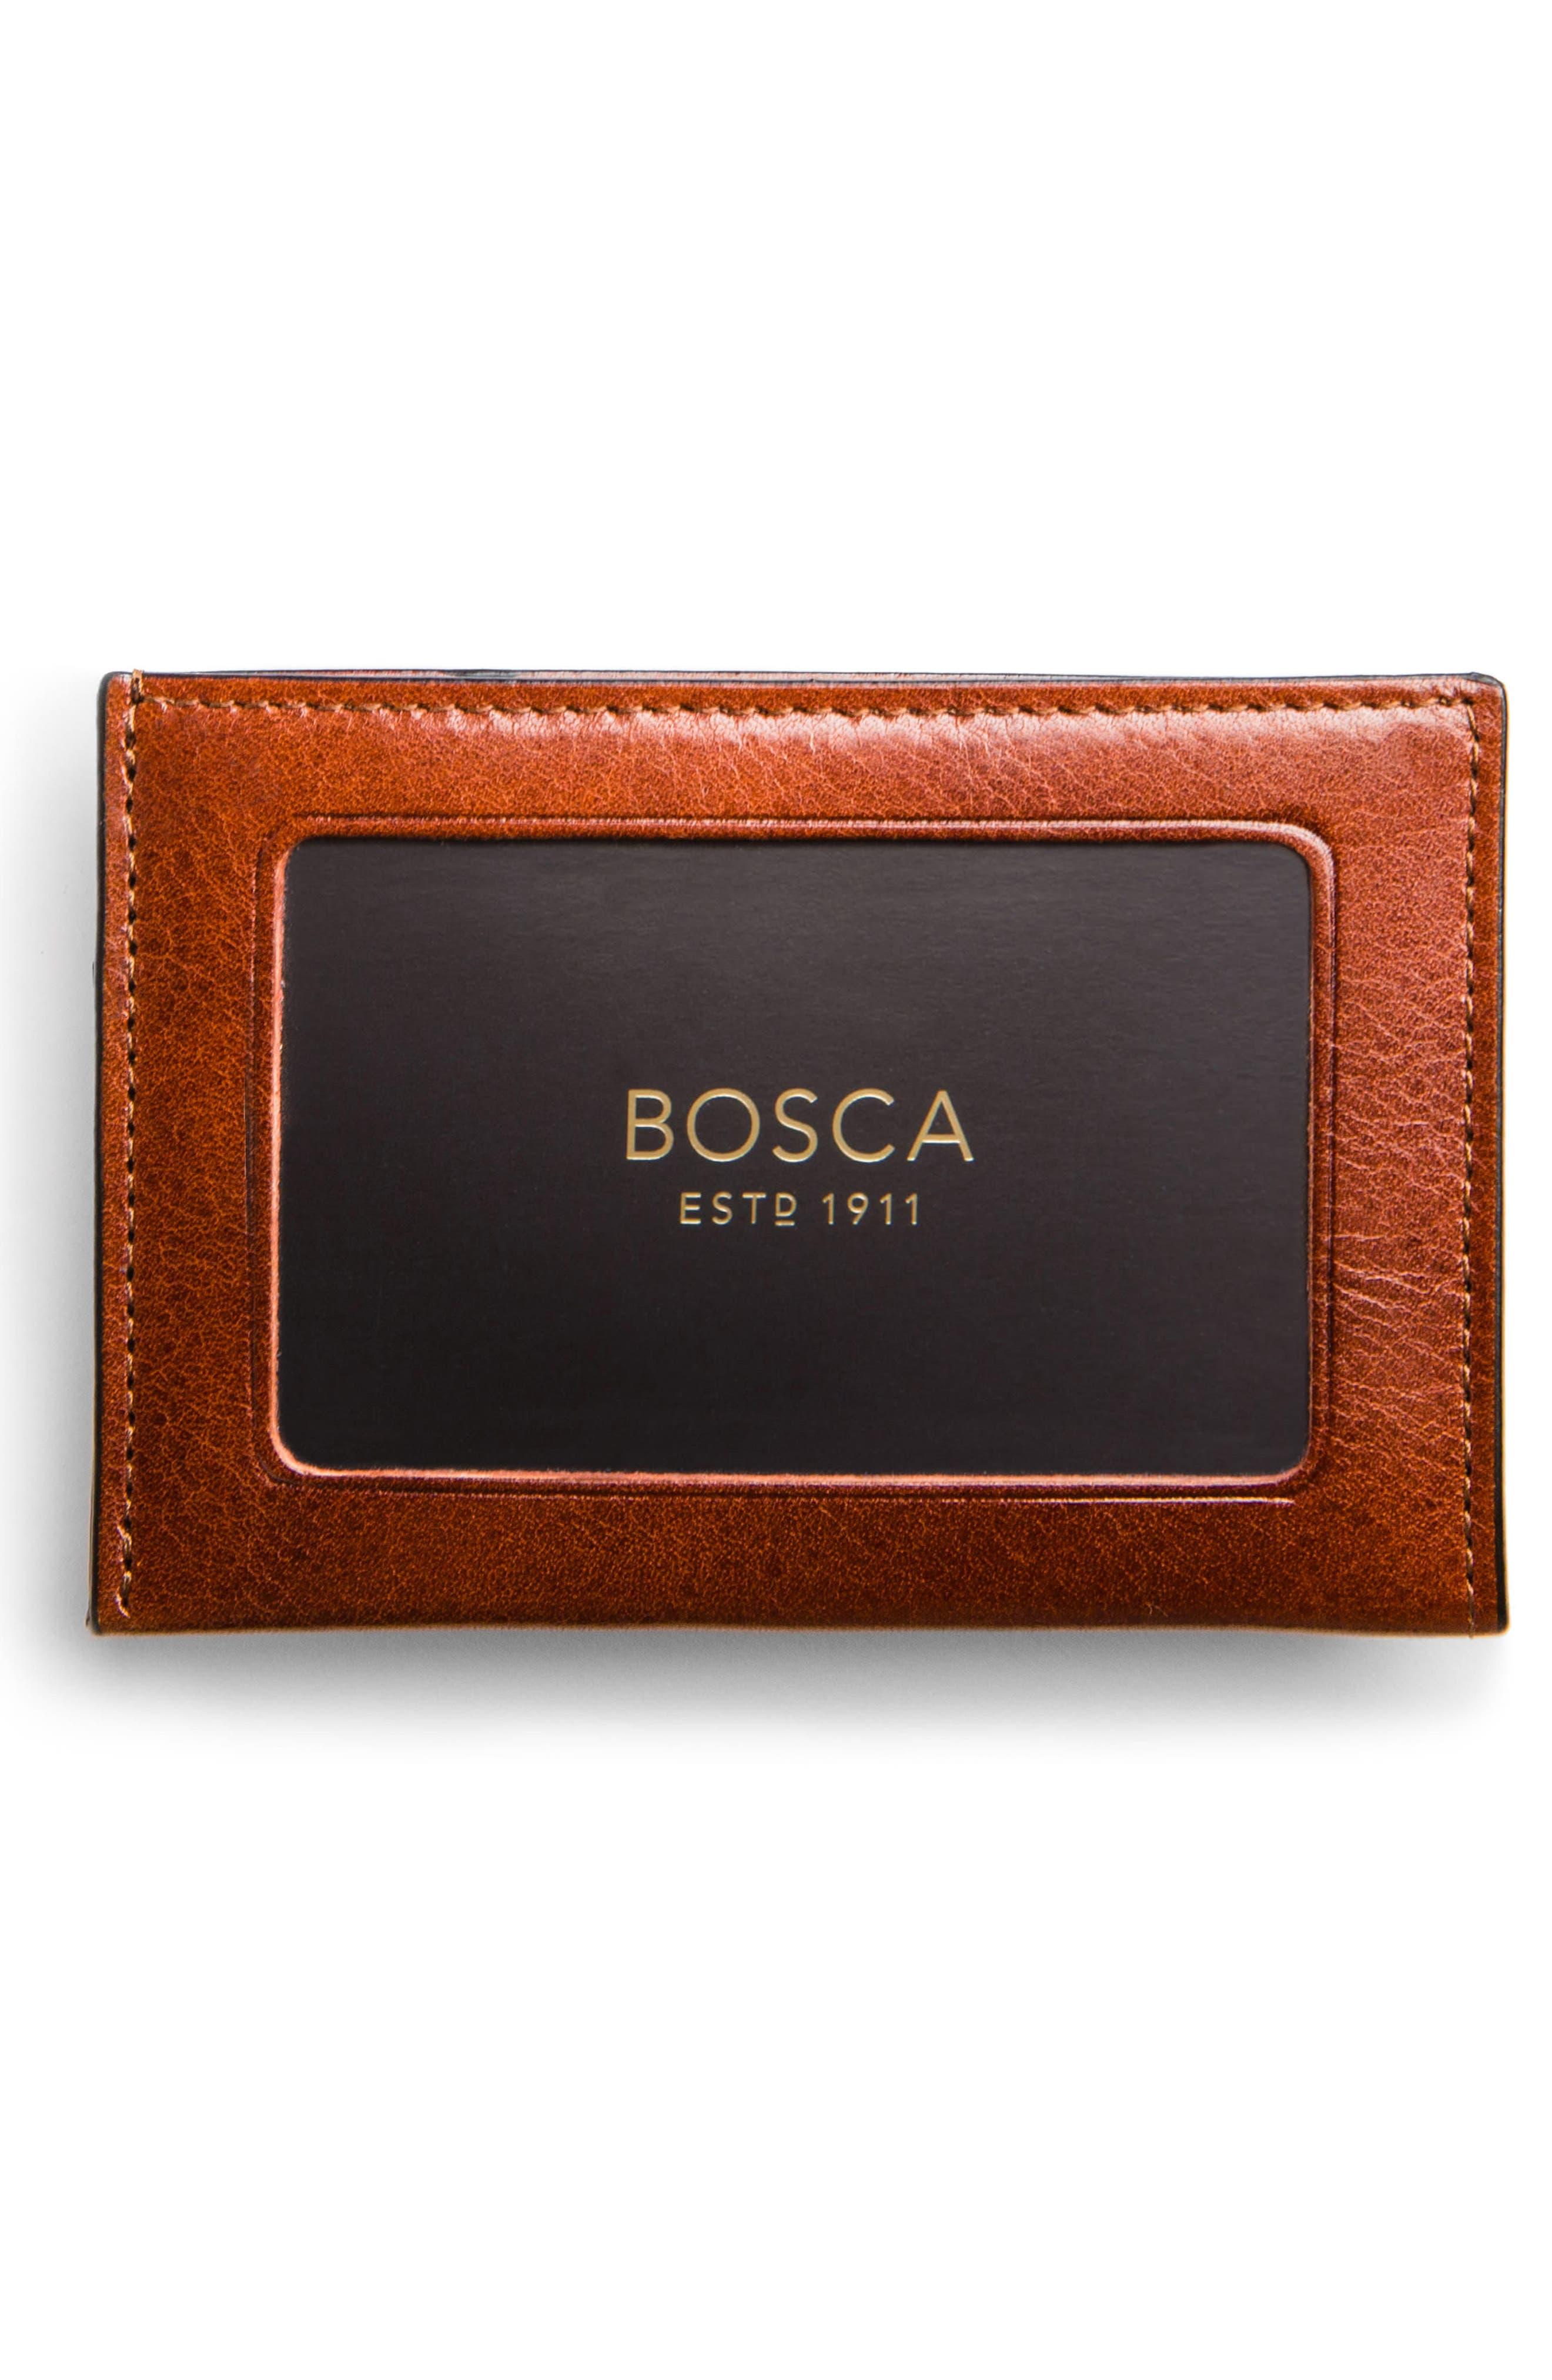 Bosca Aged Leather Wallet